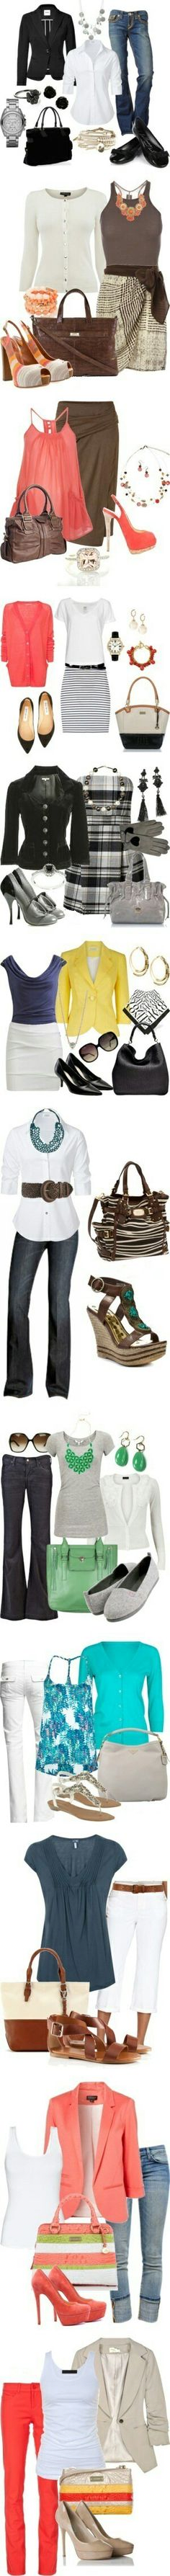 LOLO Moda: www.lolomoda.com